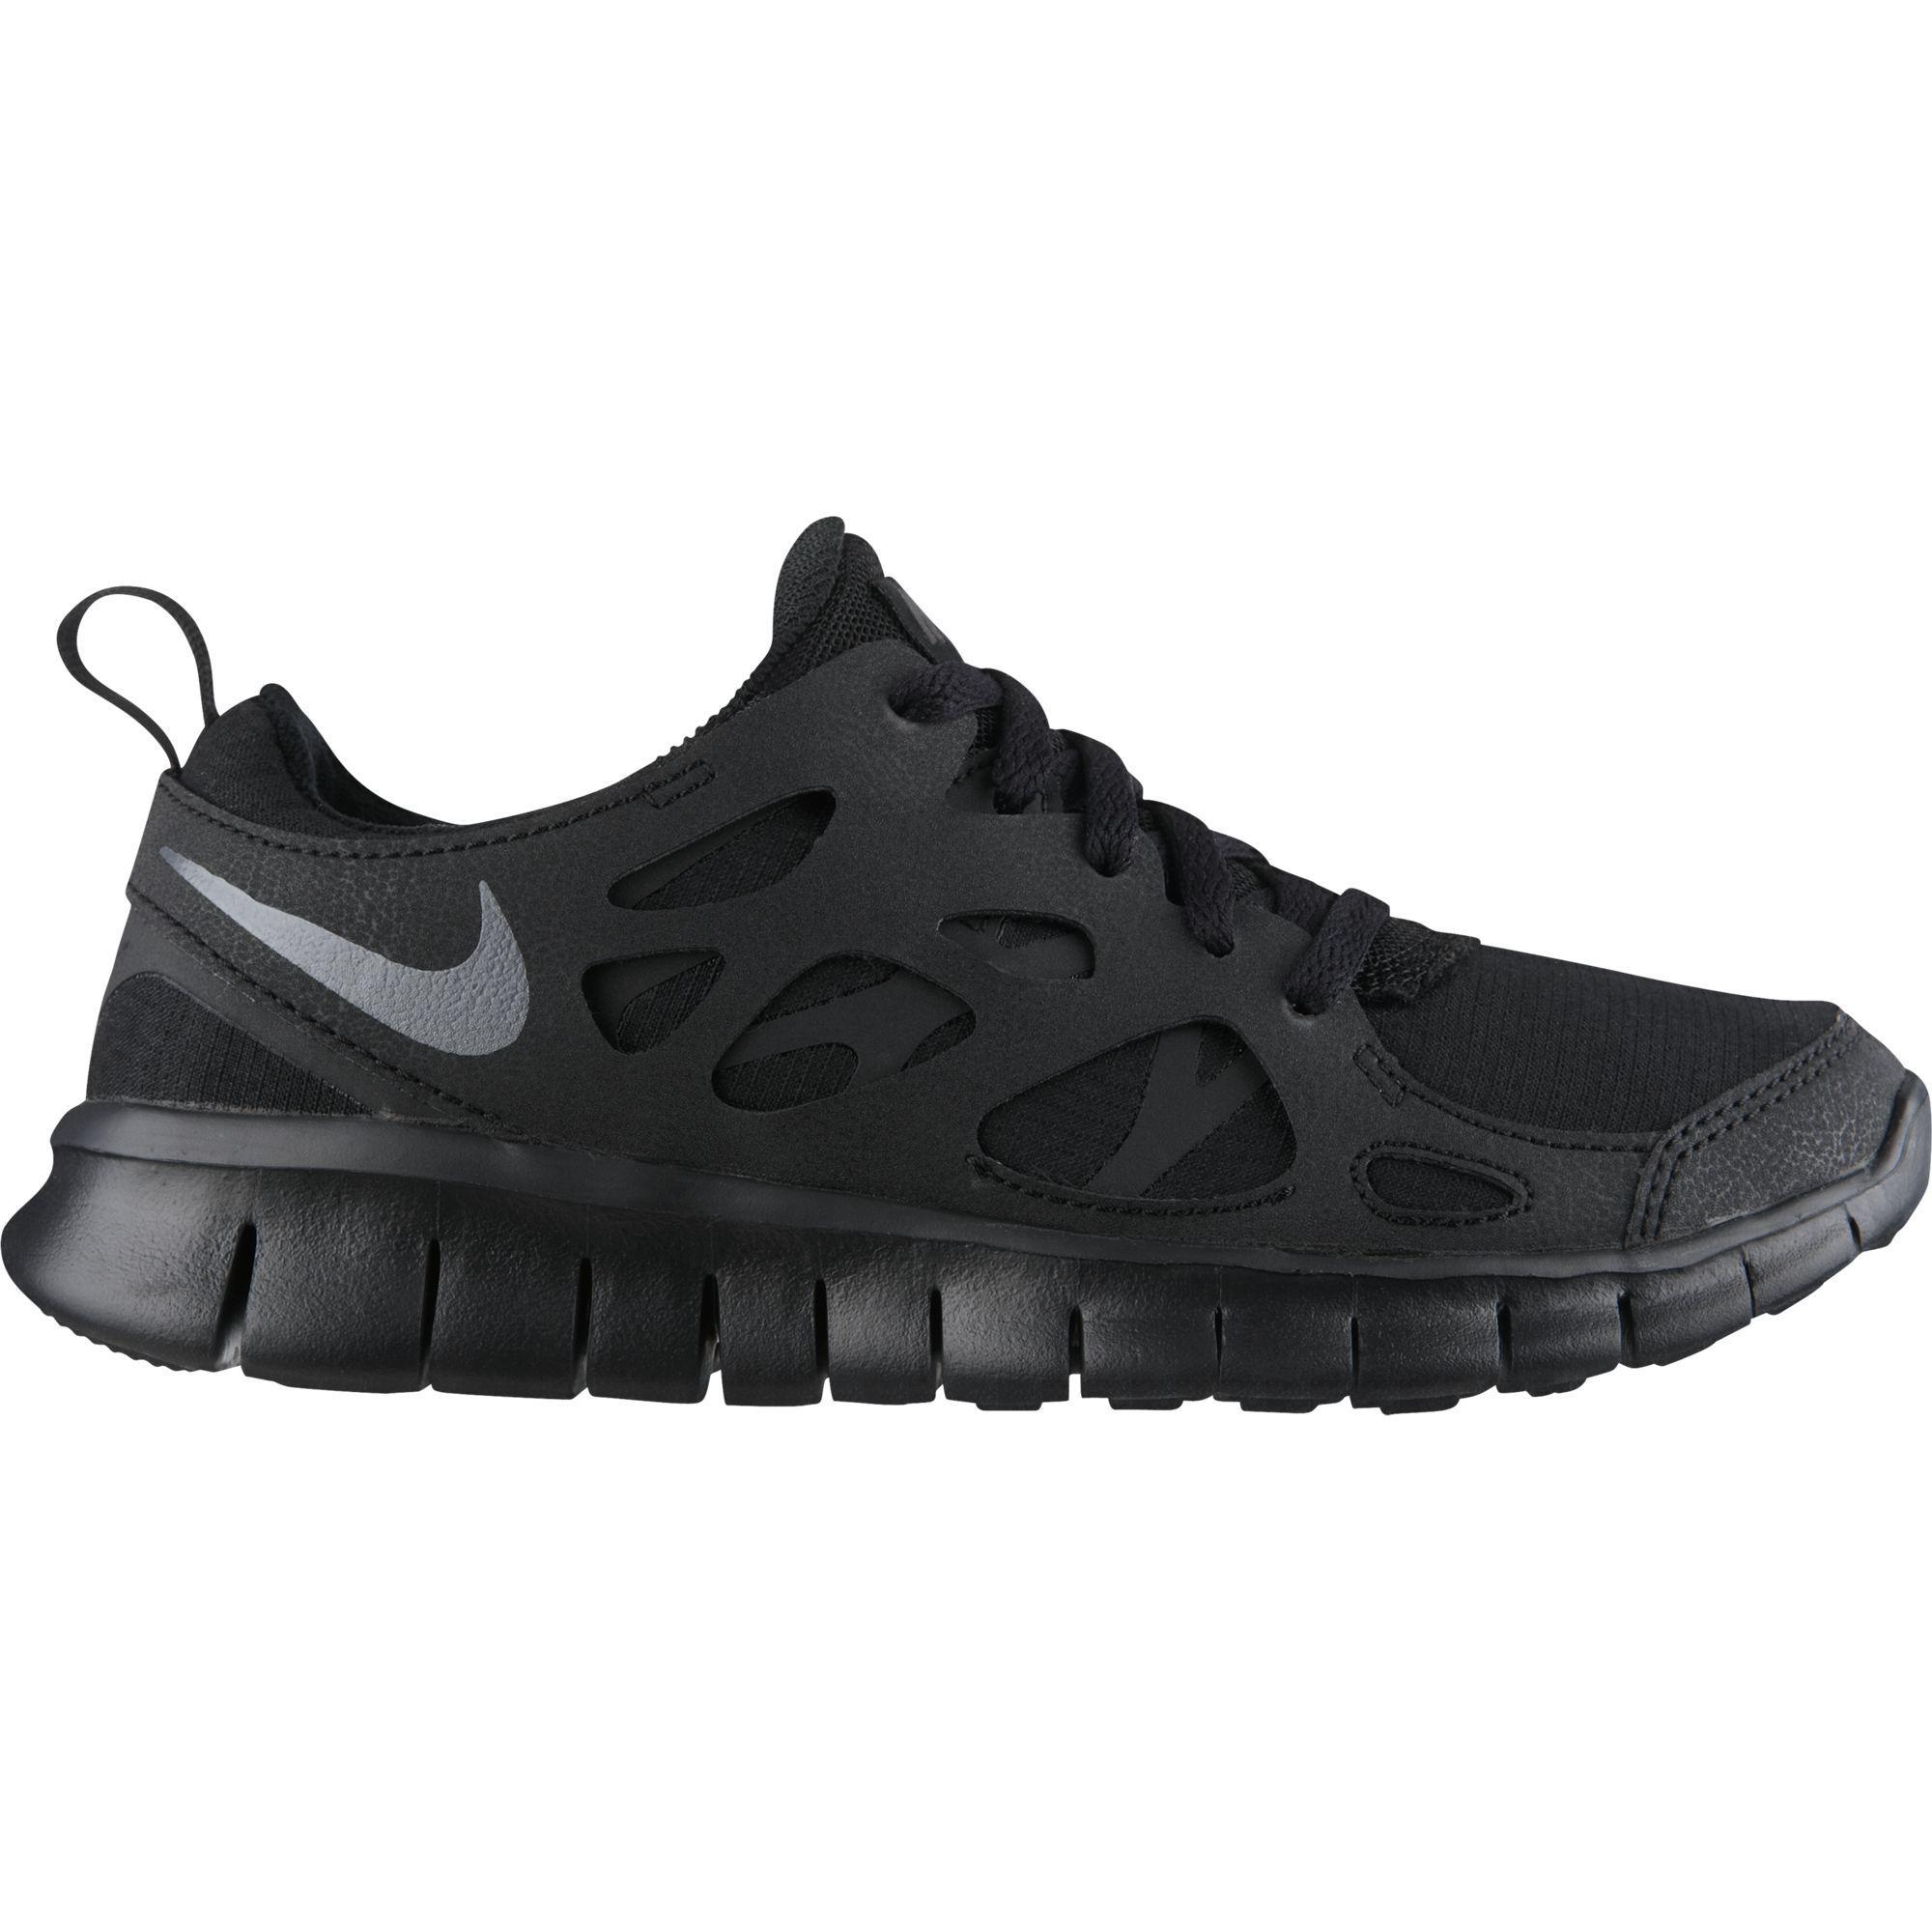 Nike Boys Free Run 2 Running Shoes - Black